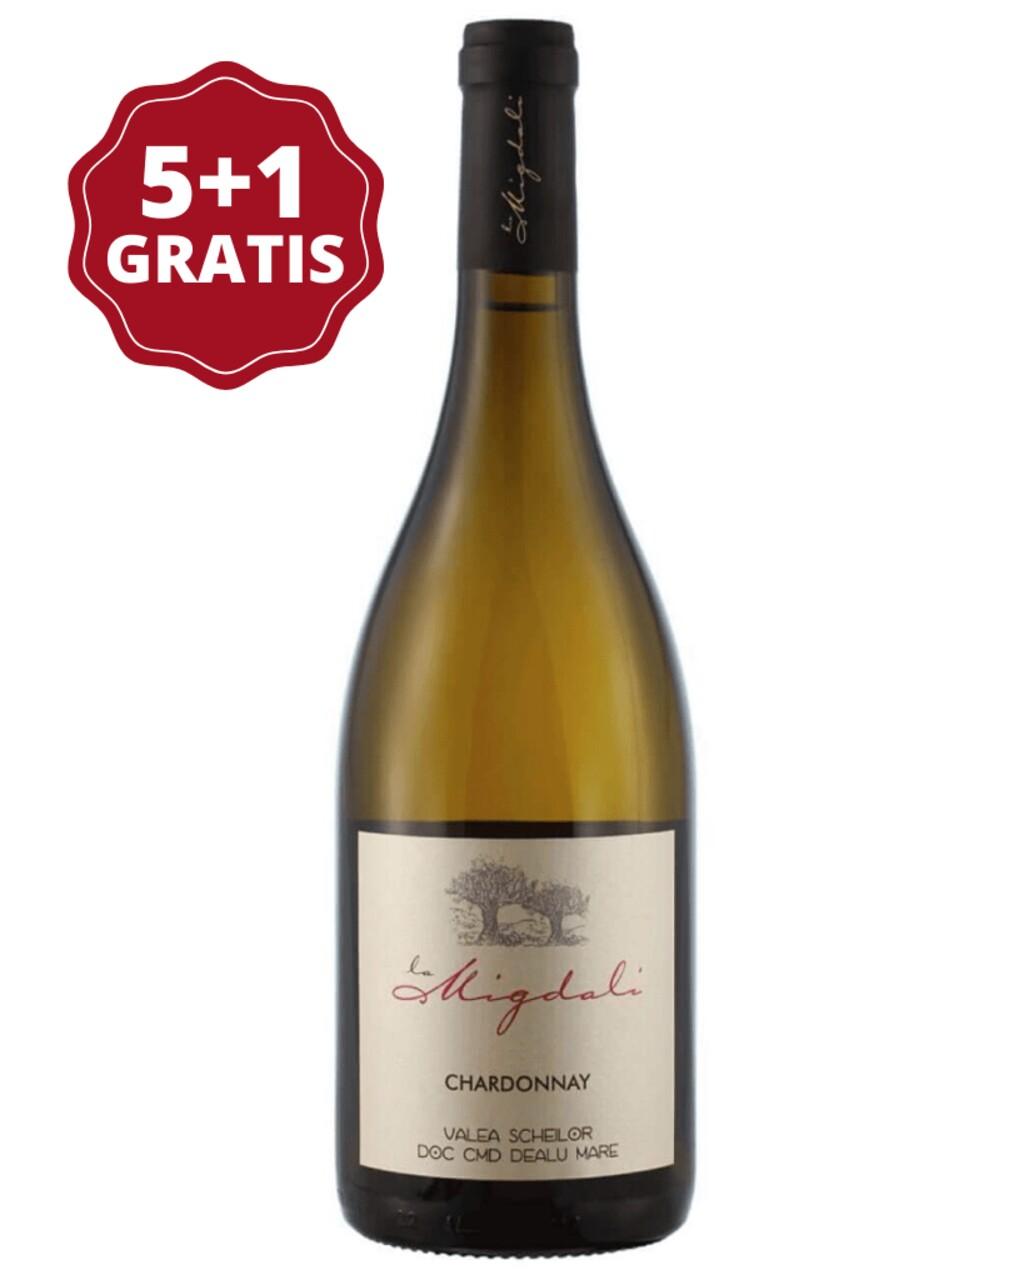 La Migdali Chardonnay 5+1